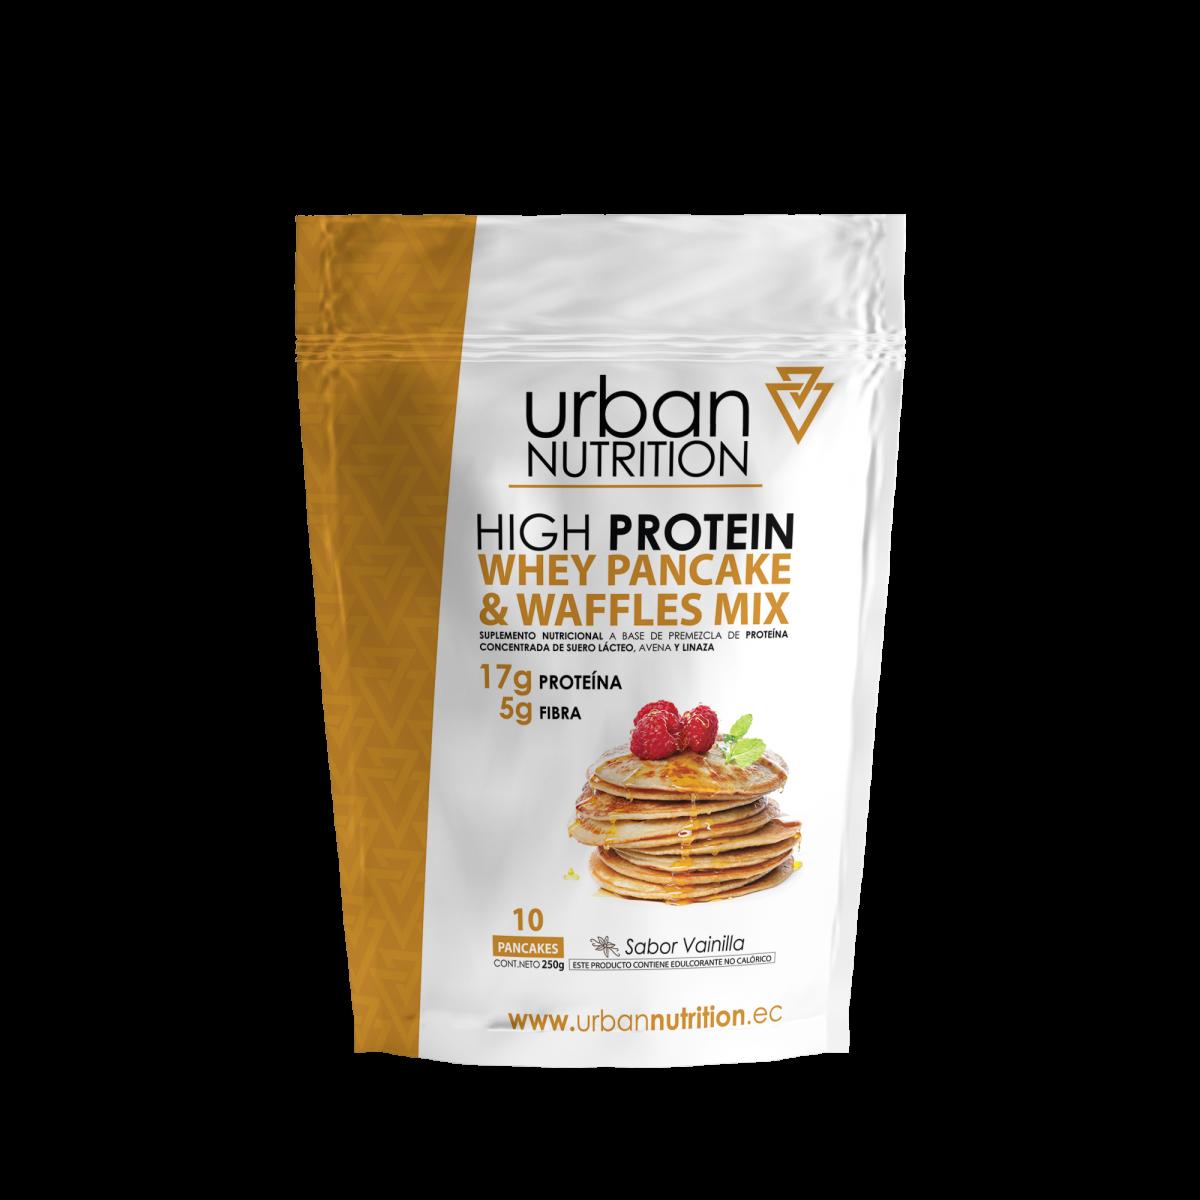 mezcla de proteina para ejercicio fitness dieta baja en calorias saludable fitness ecuador precio bajo proteina de suero lacteo proteina whey albumina de huevo linaza avena fitness